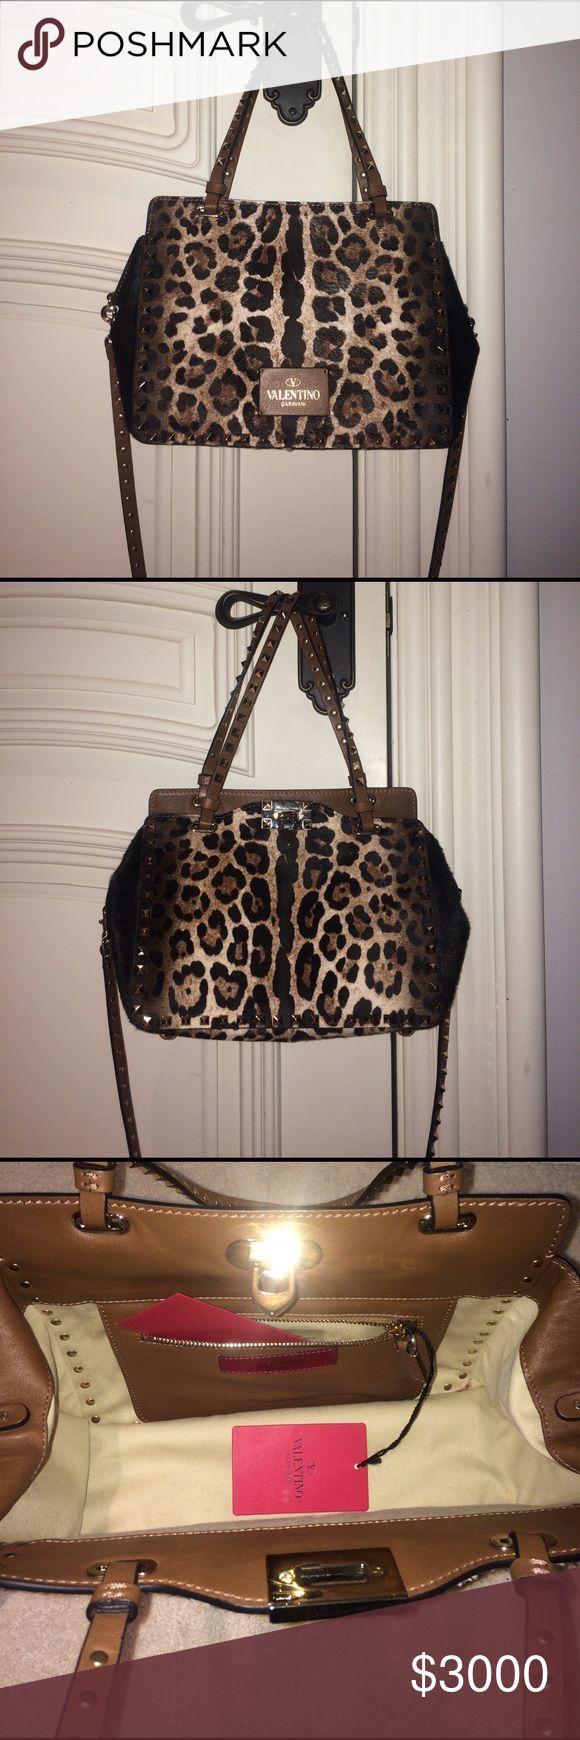 ❤️ Leopard Valentino Authentic. Brand New Leopard Valentino Garavani Valentino Garavani Bags Mini Bags